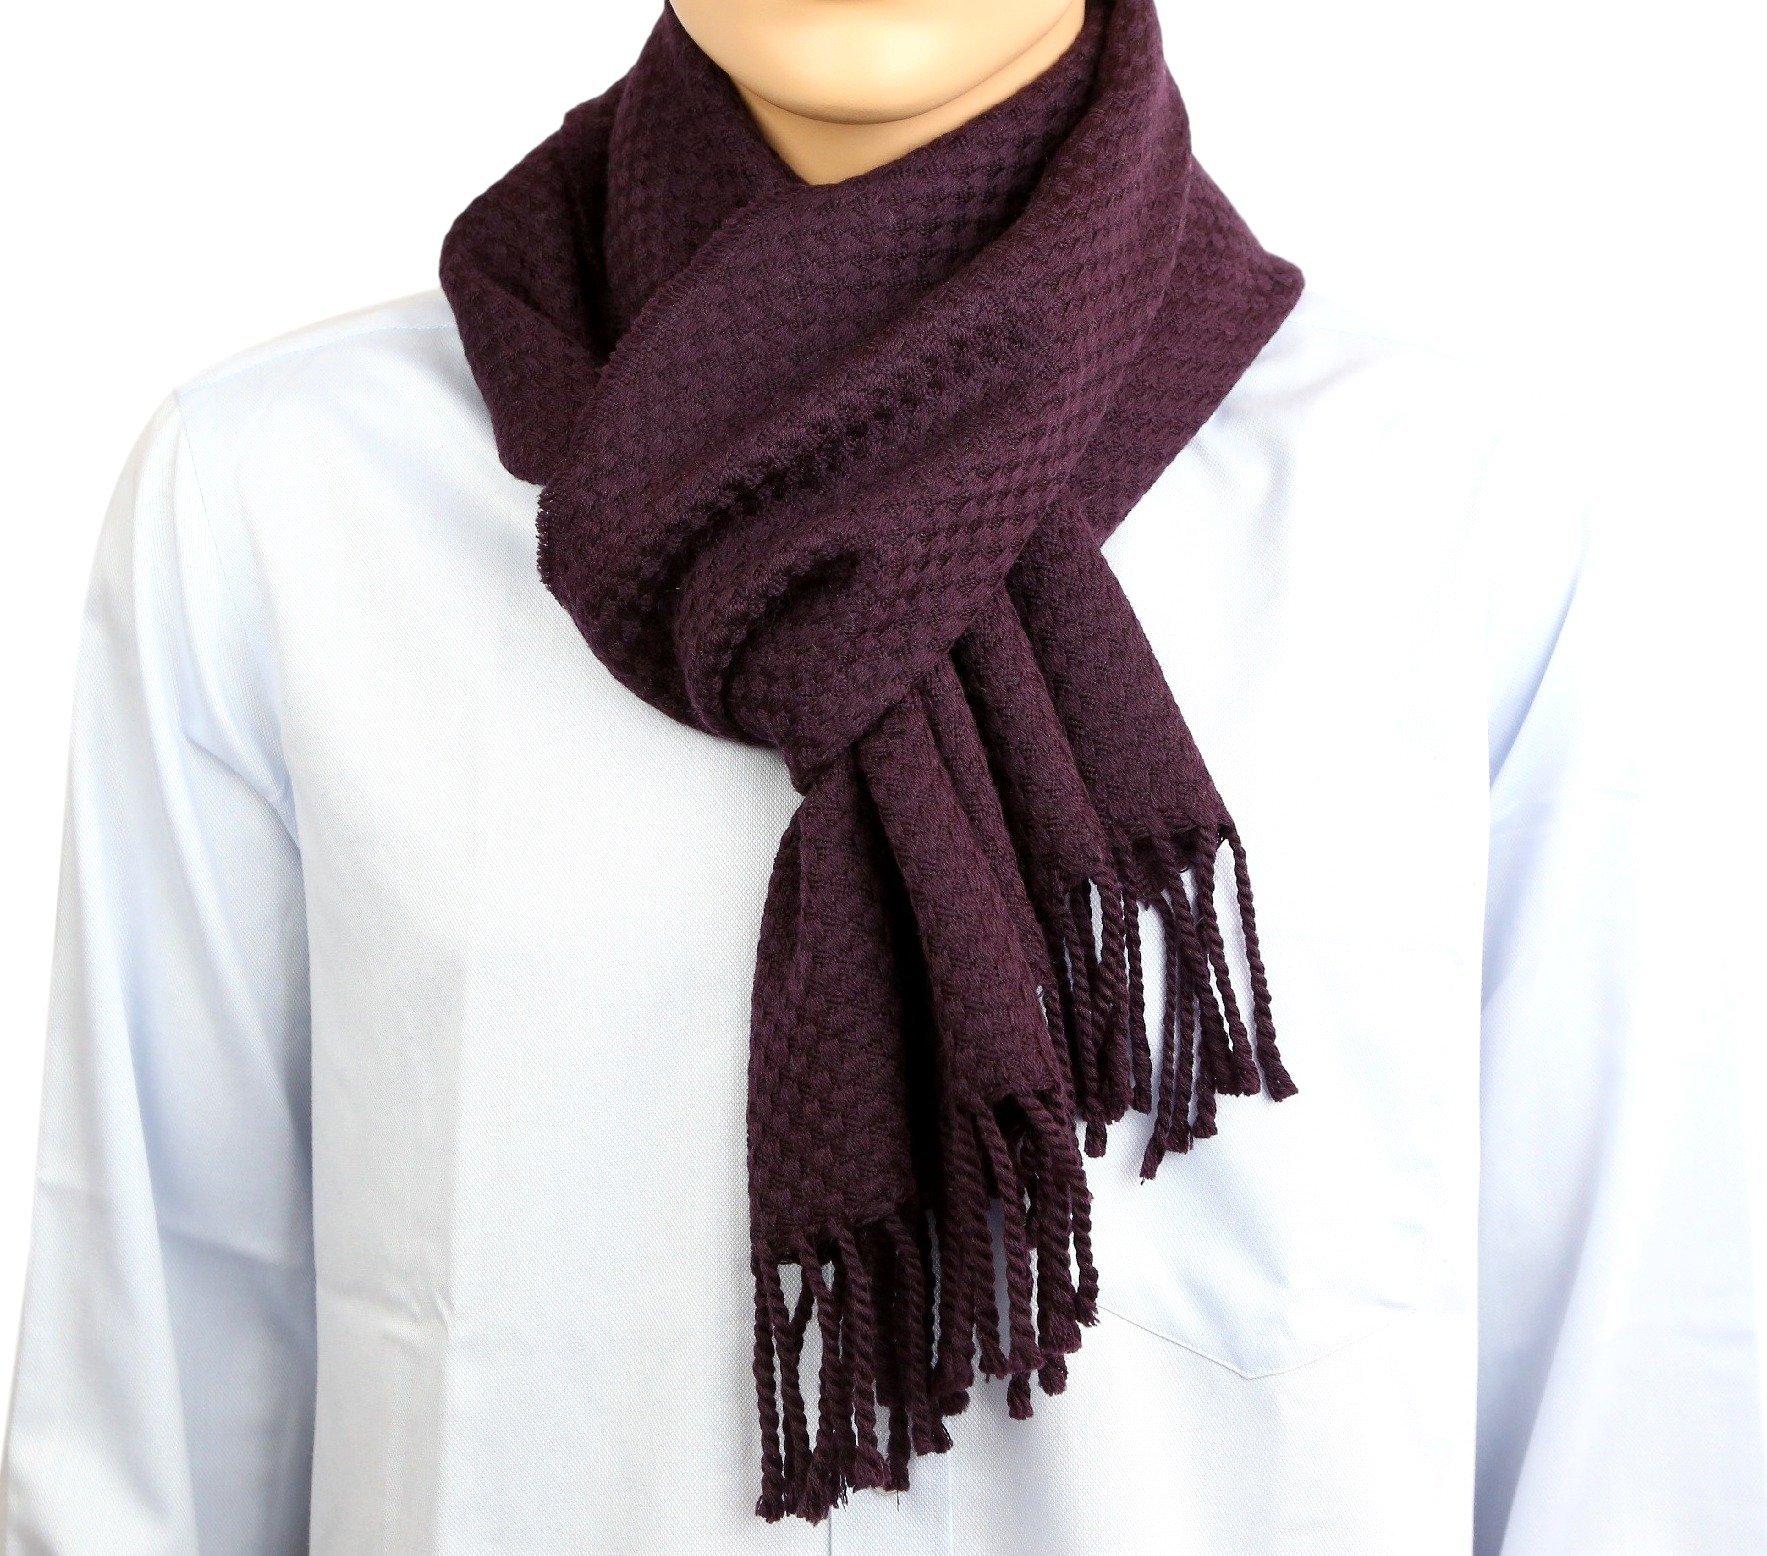 100% Wool Neck Scarf For Men Warm Light Soft 11 x 70 Inch,165 Grams,Grey